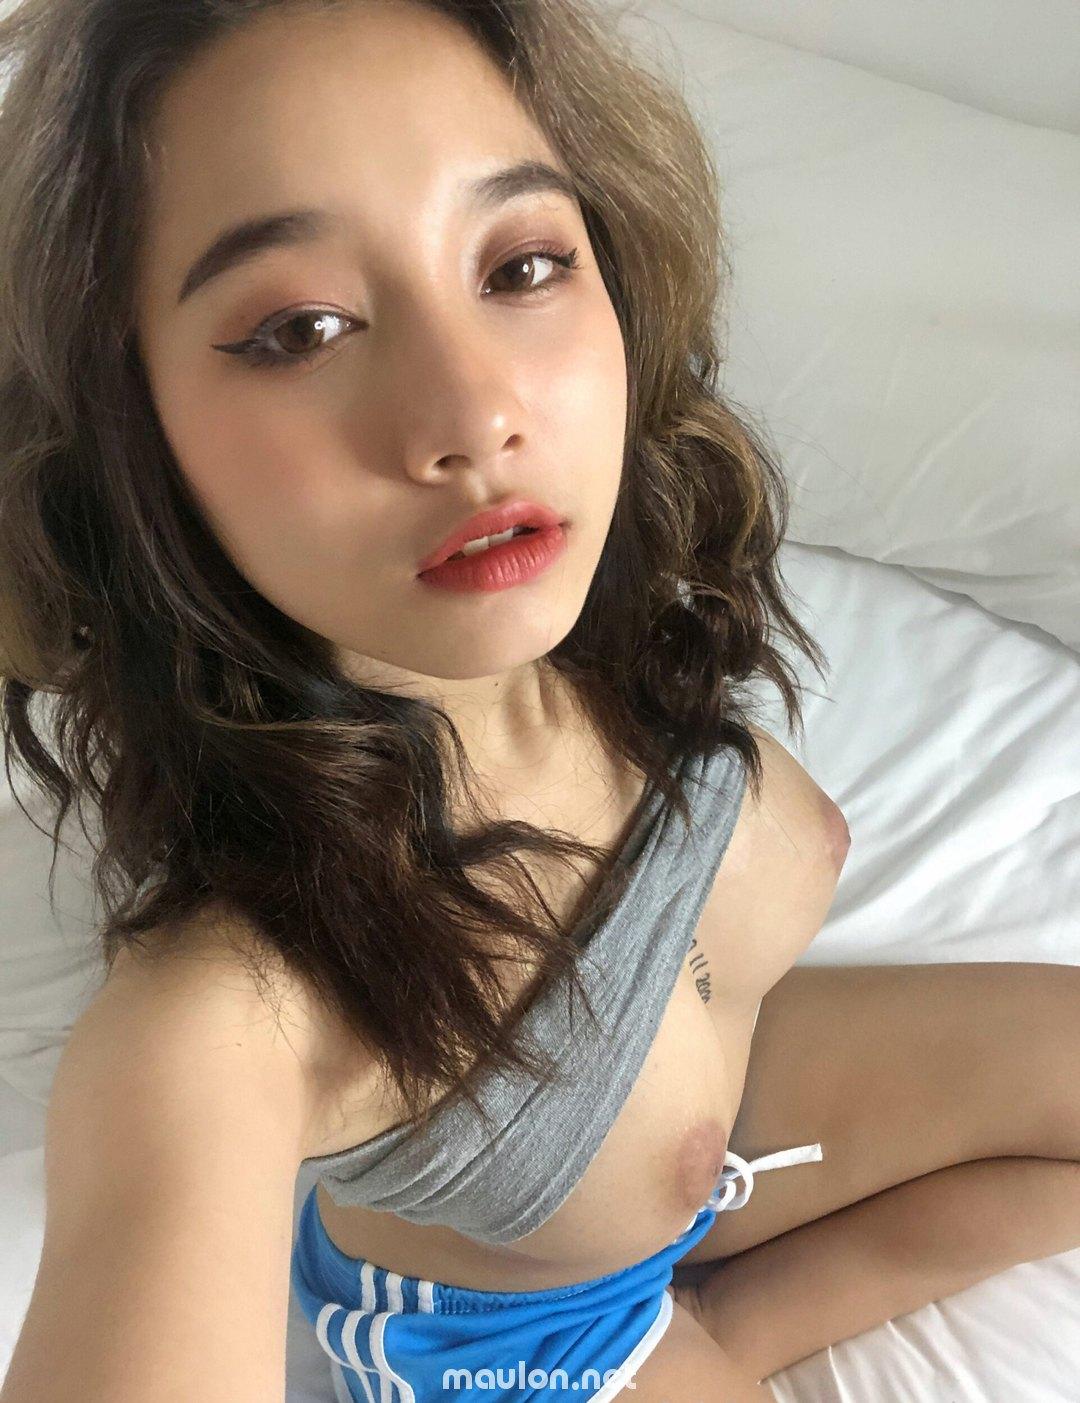 AnhSex.In - Ảnh sex girl xinh OnlyFans Irisadamsone